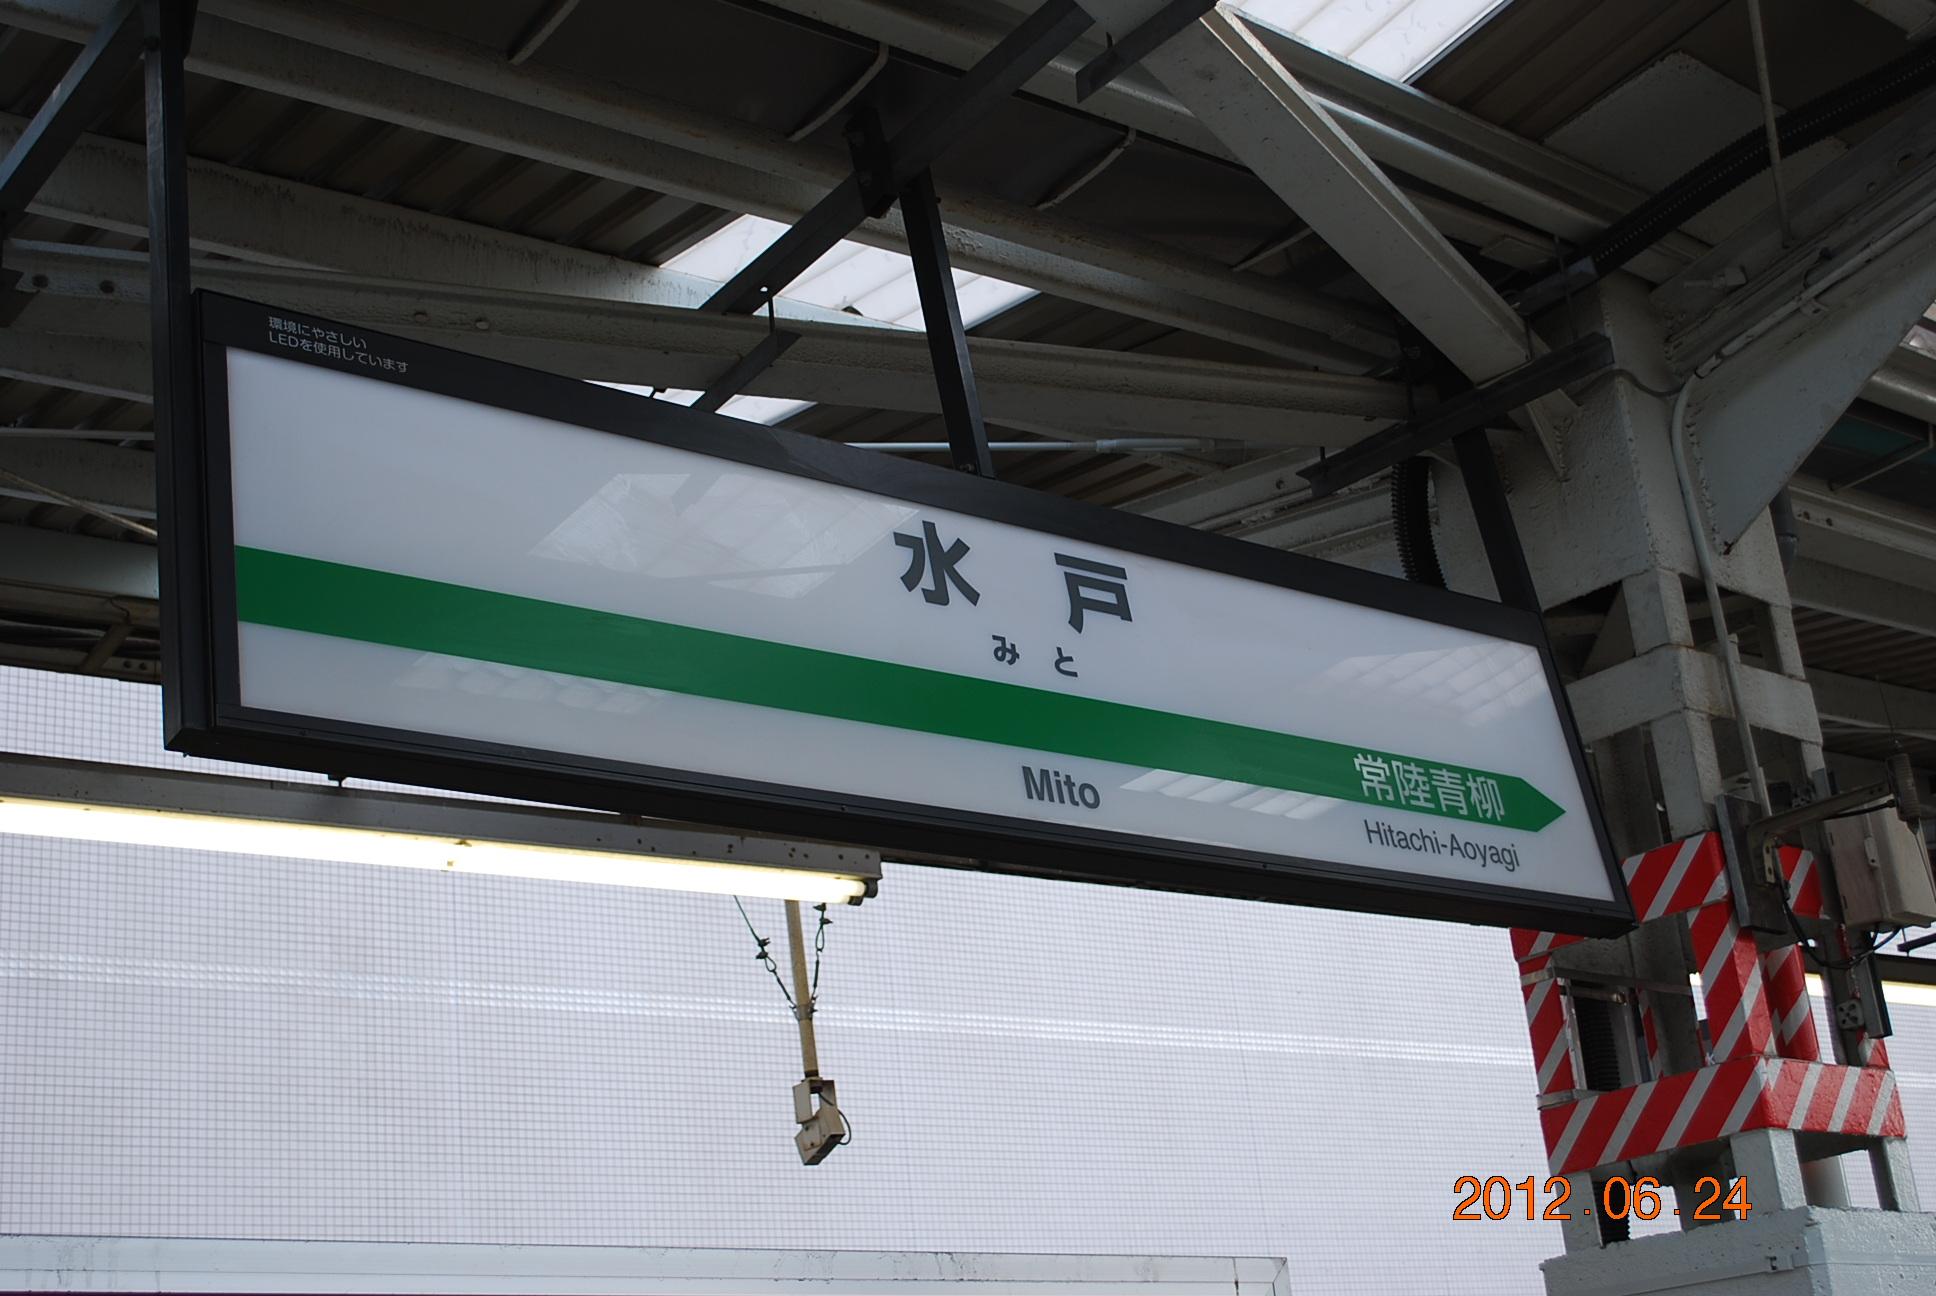 2012_0624_071051-DSC_0439.jpg